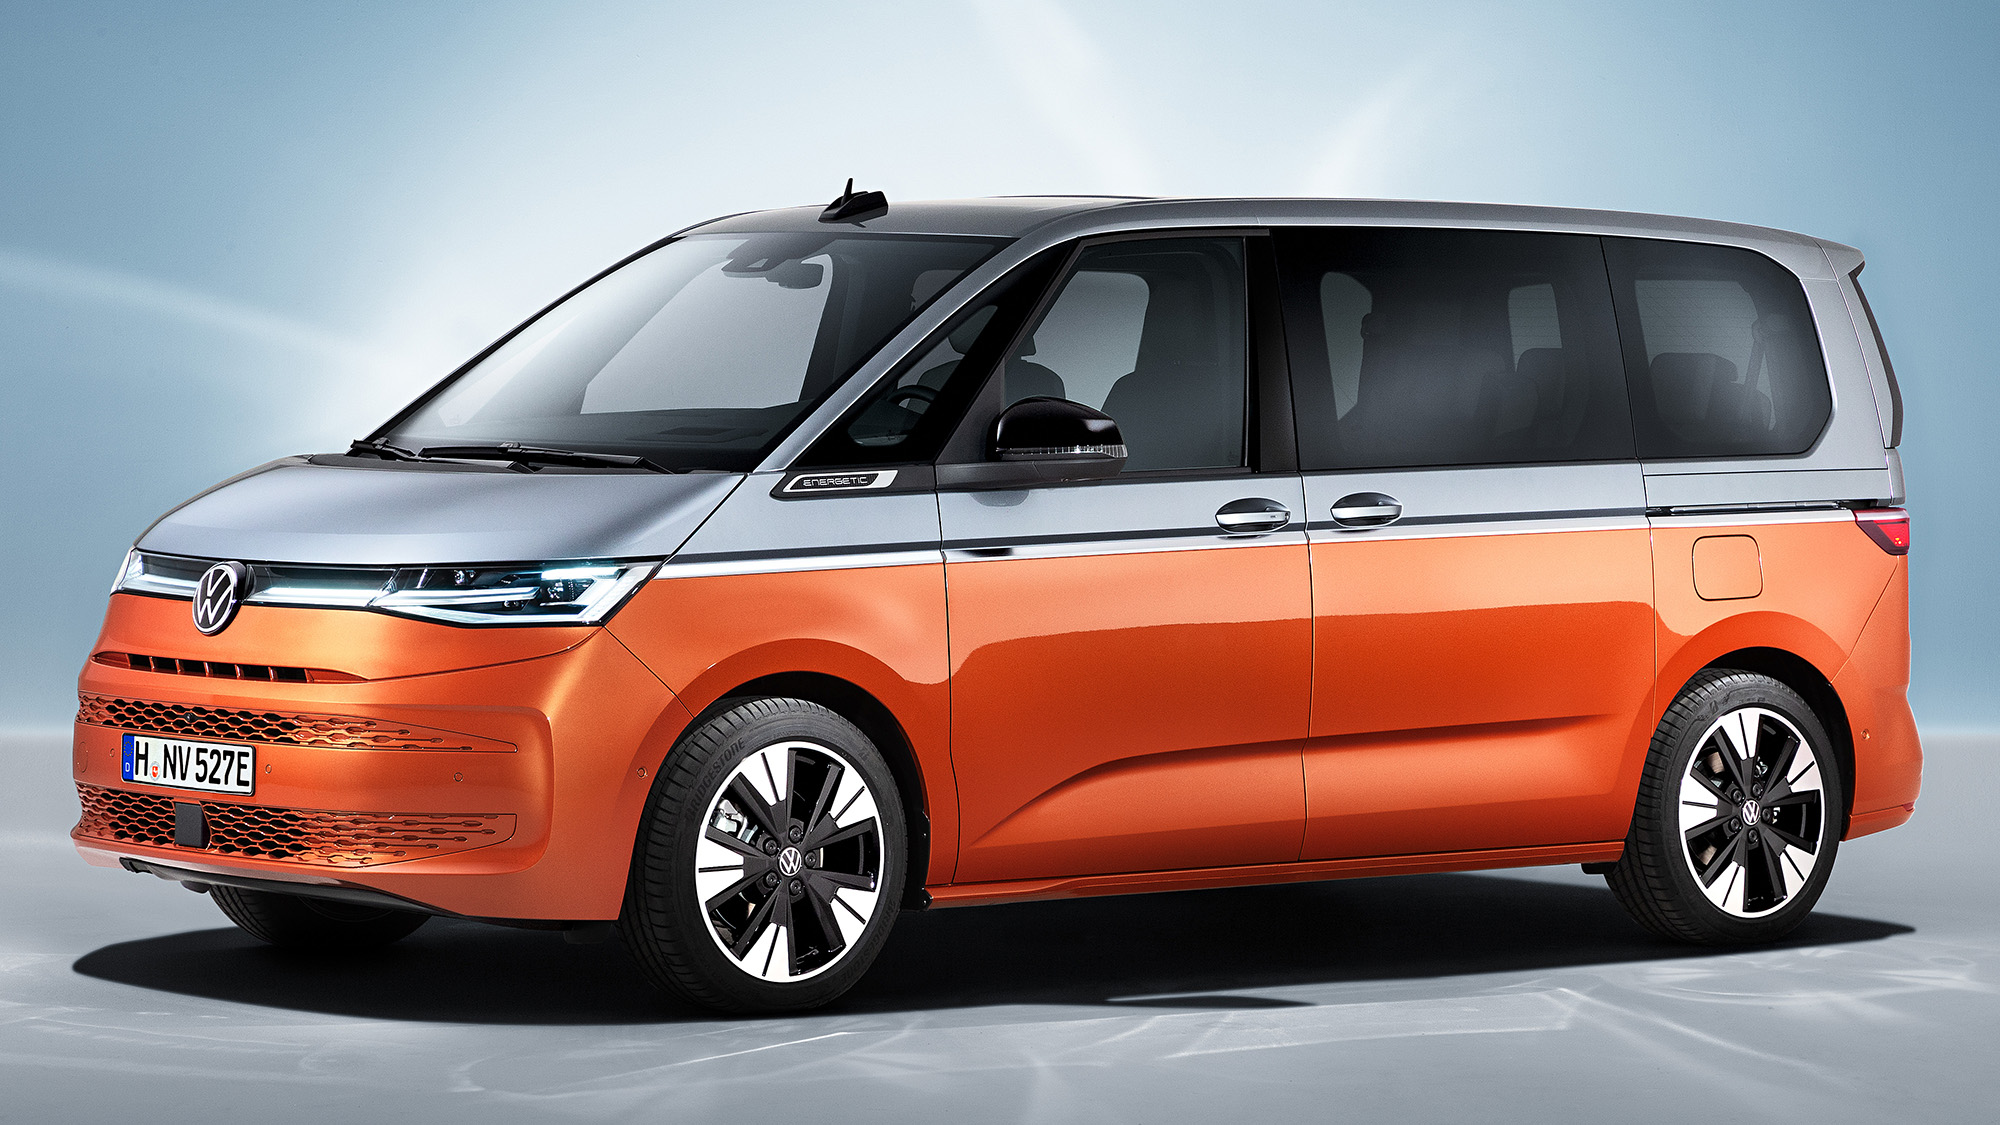 Volkswagent-T7-Multivan-lateral-frente.jpg